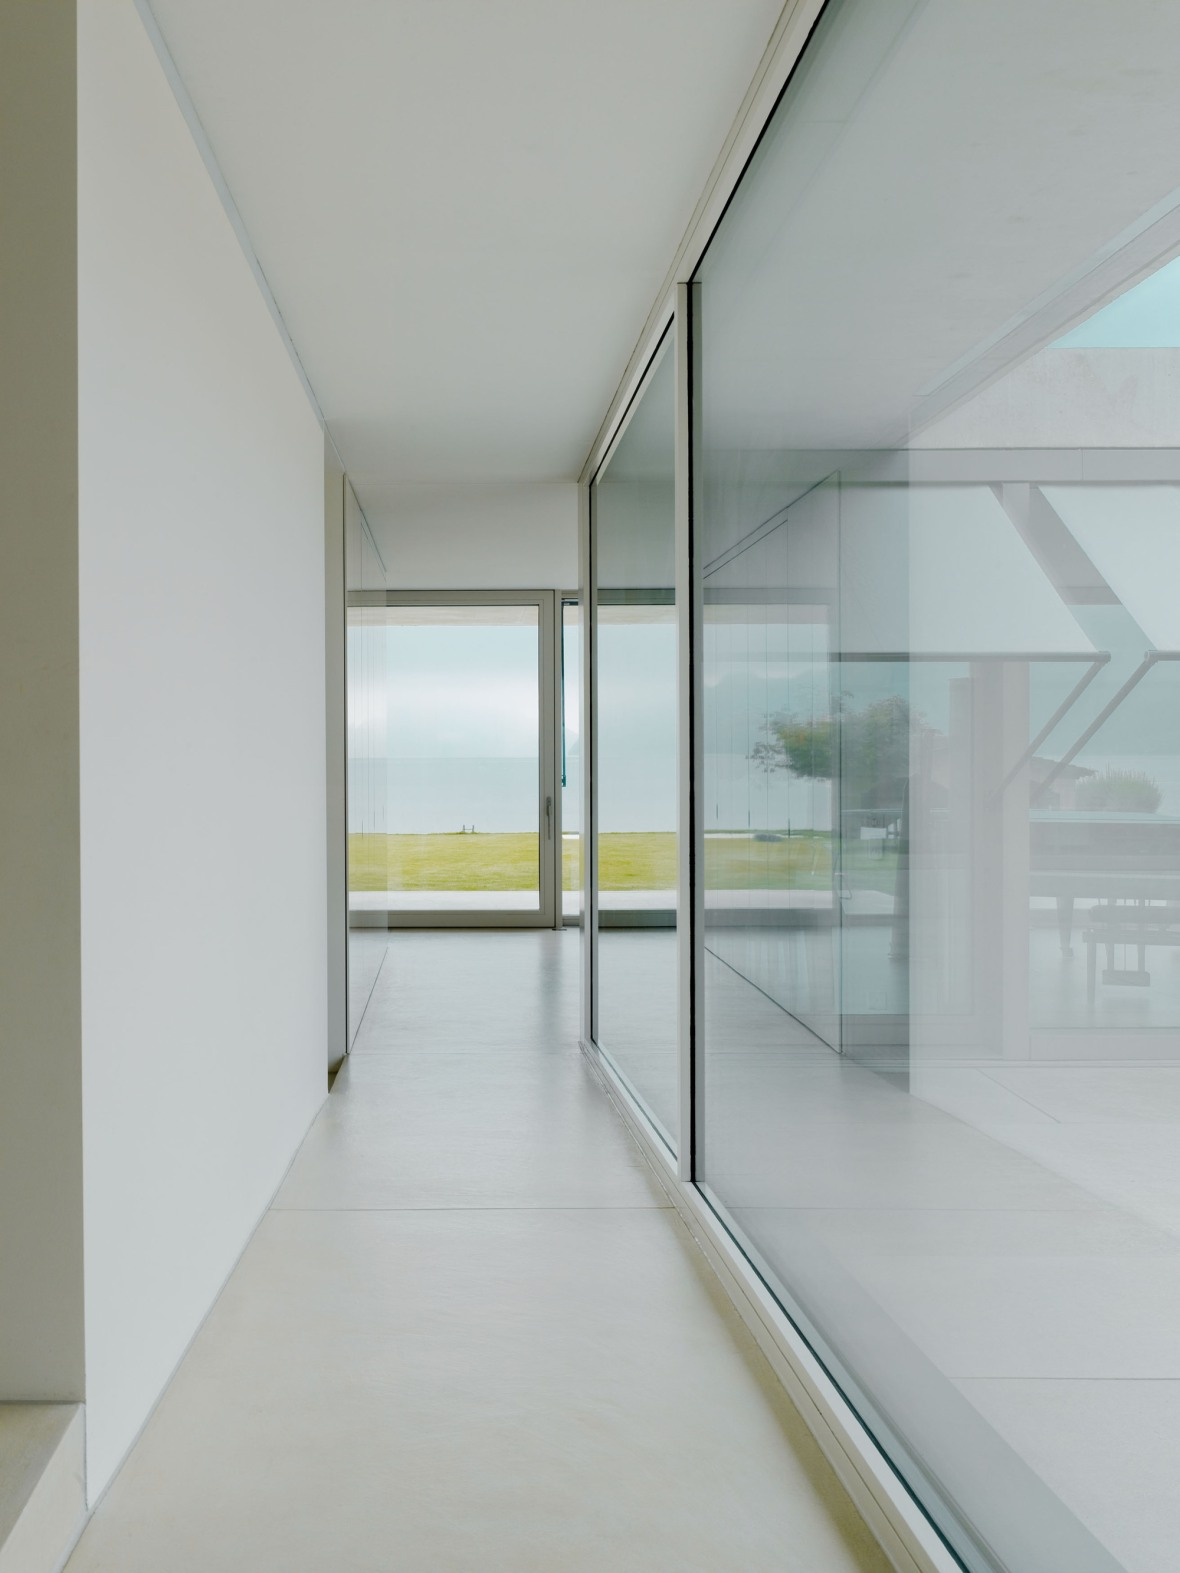 525d43fbe8e44ecb17000998_villa-m-niklaus-graber-christoph-steiger-architekten_13a